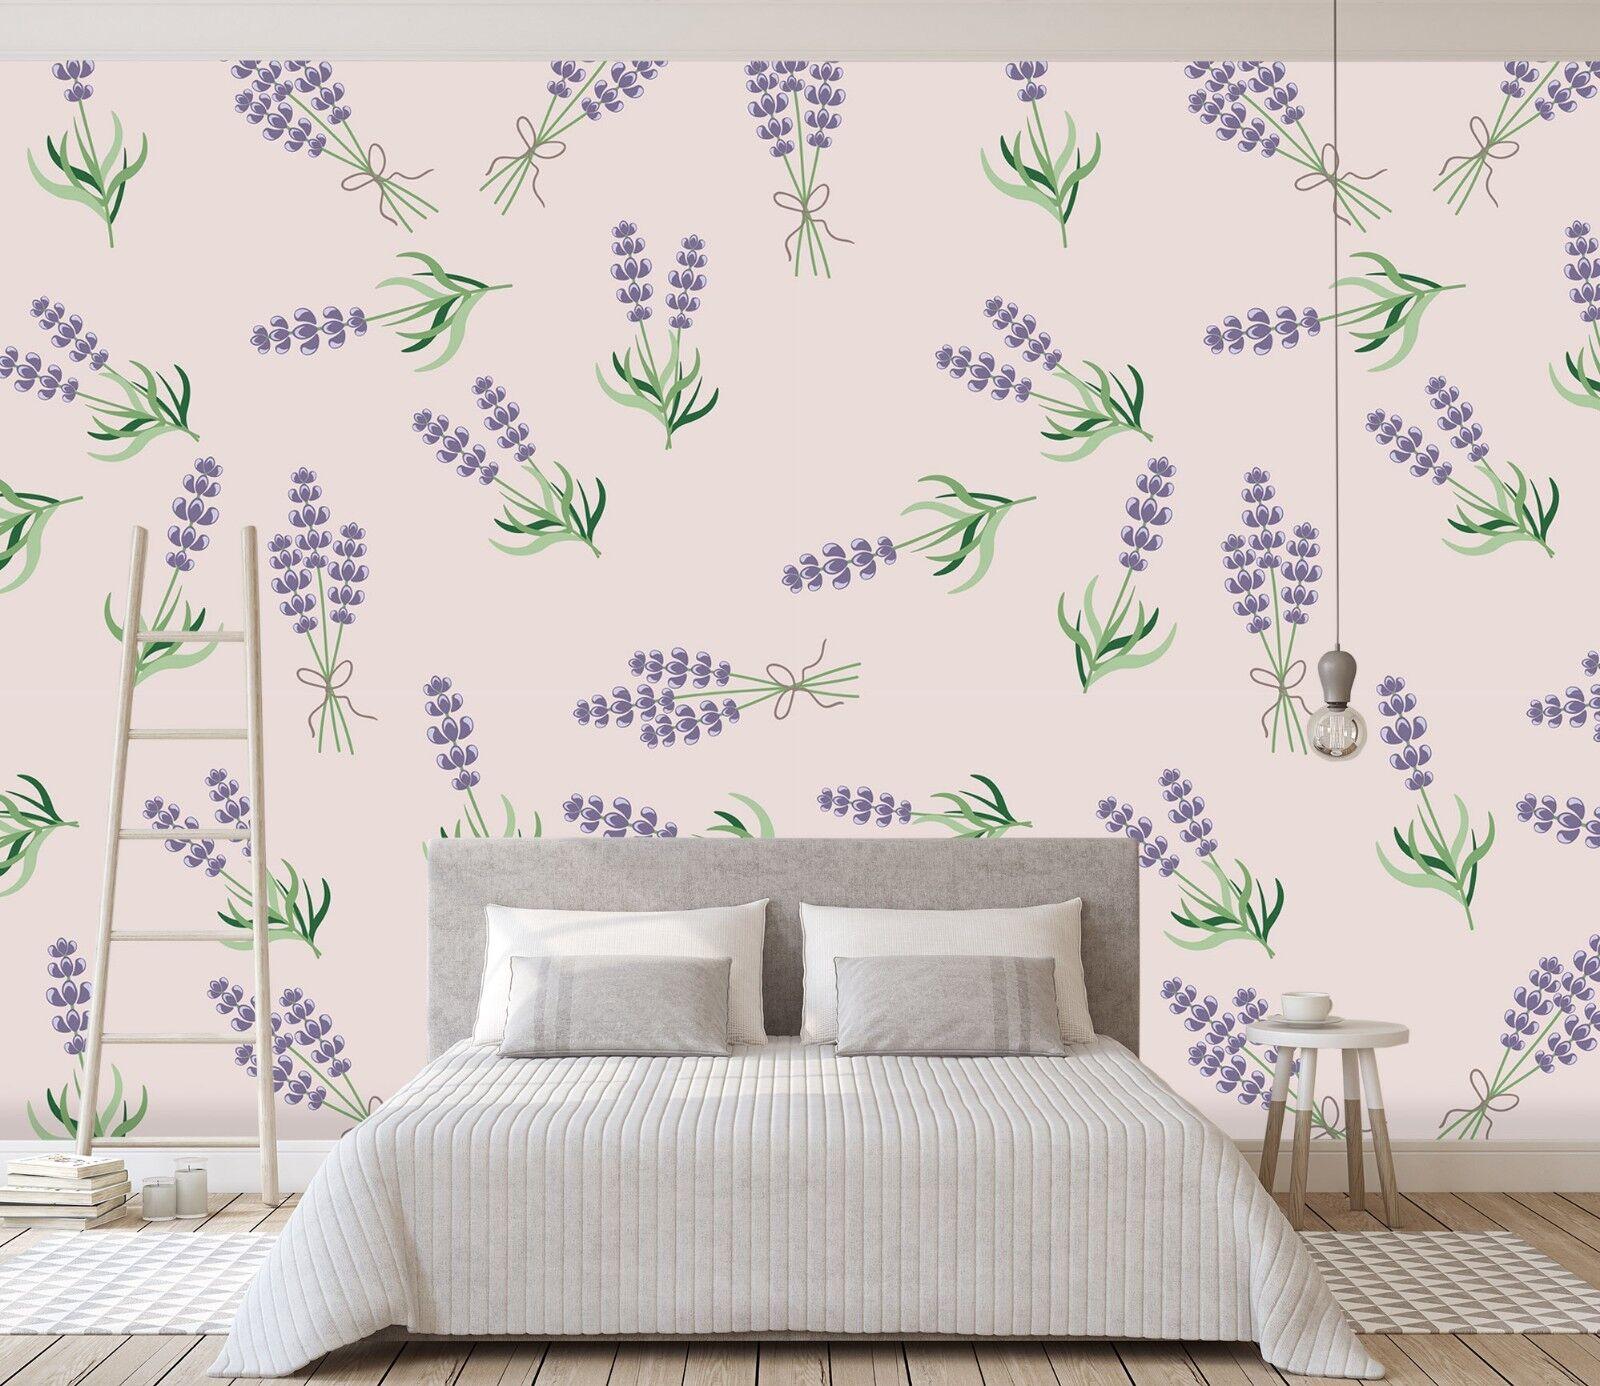 3D Grass Nature 810 Wall Paper Print Wall Decal Deco Indoor Wall Murals US